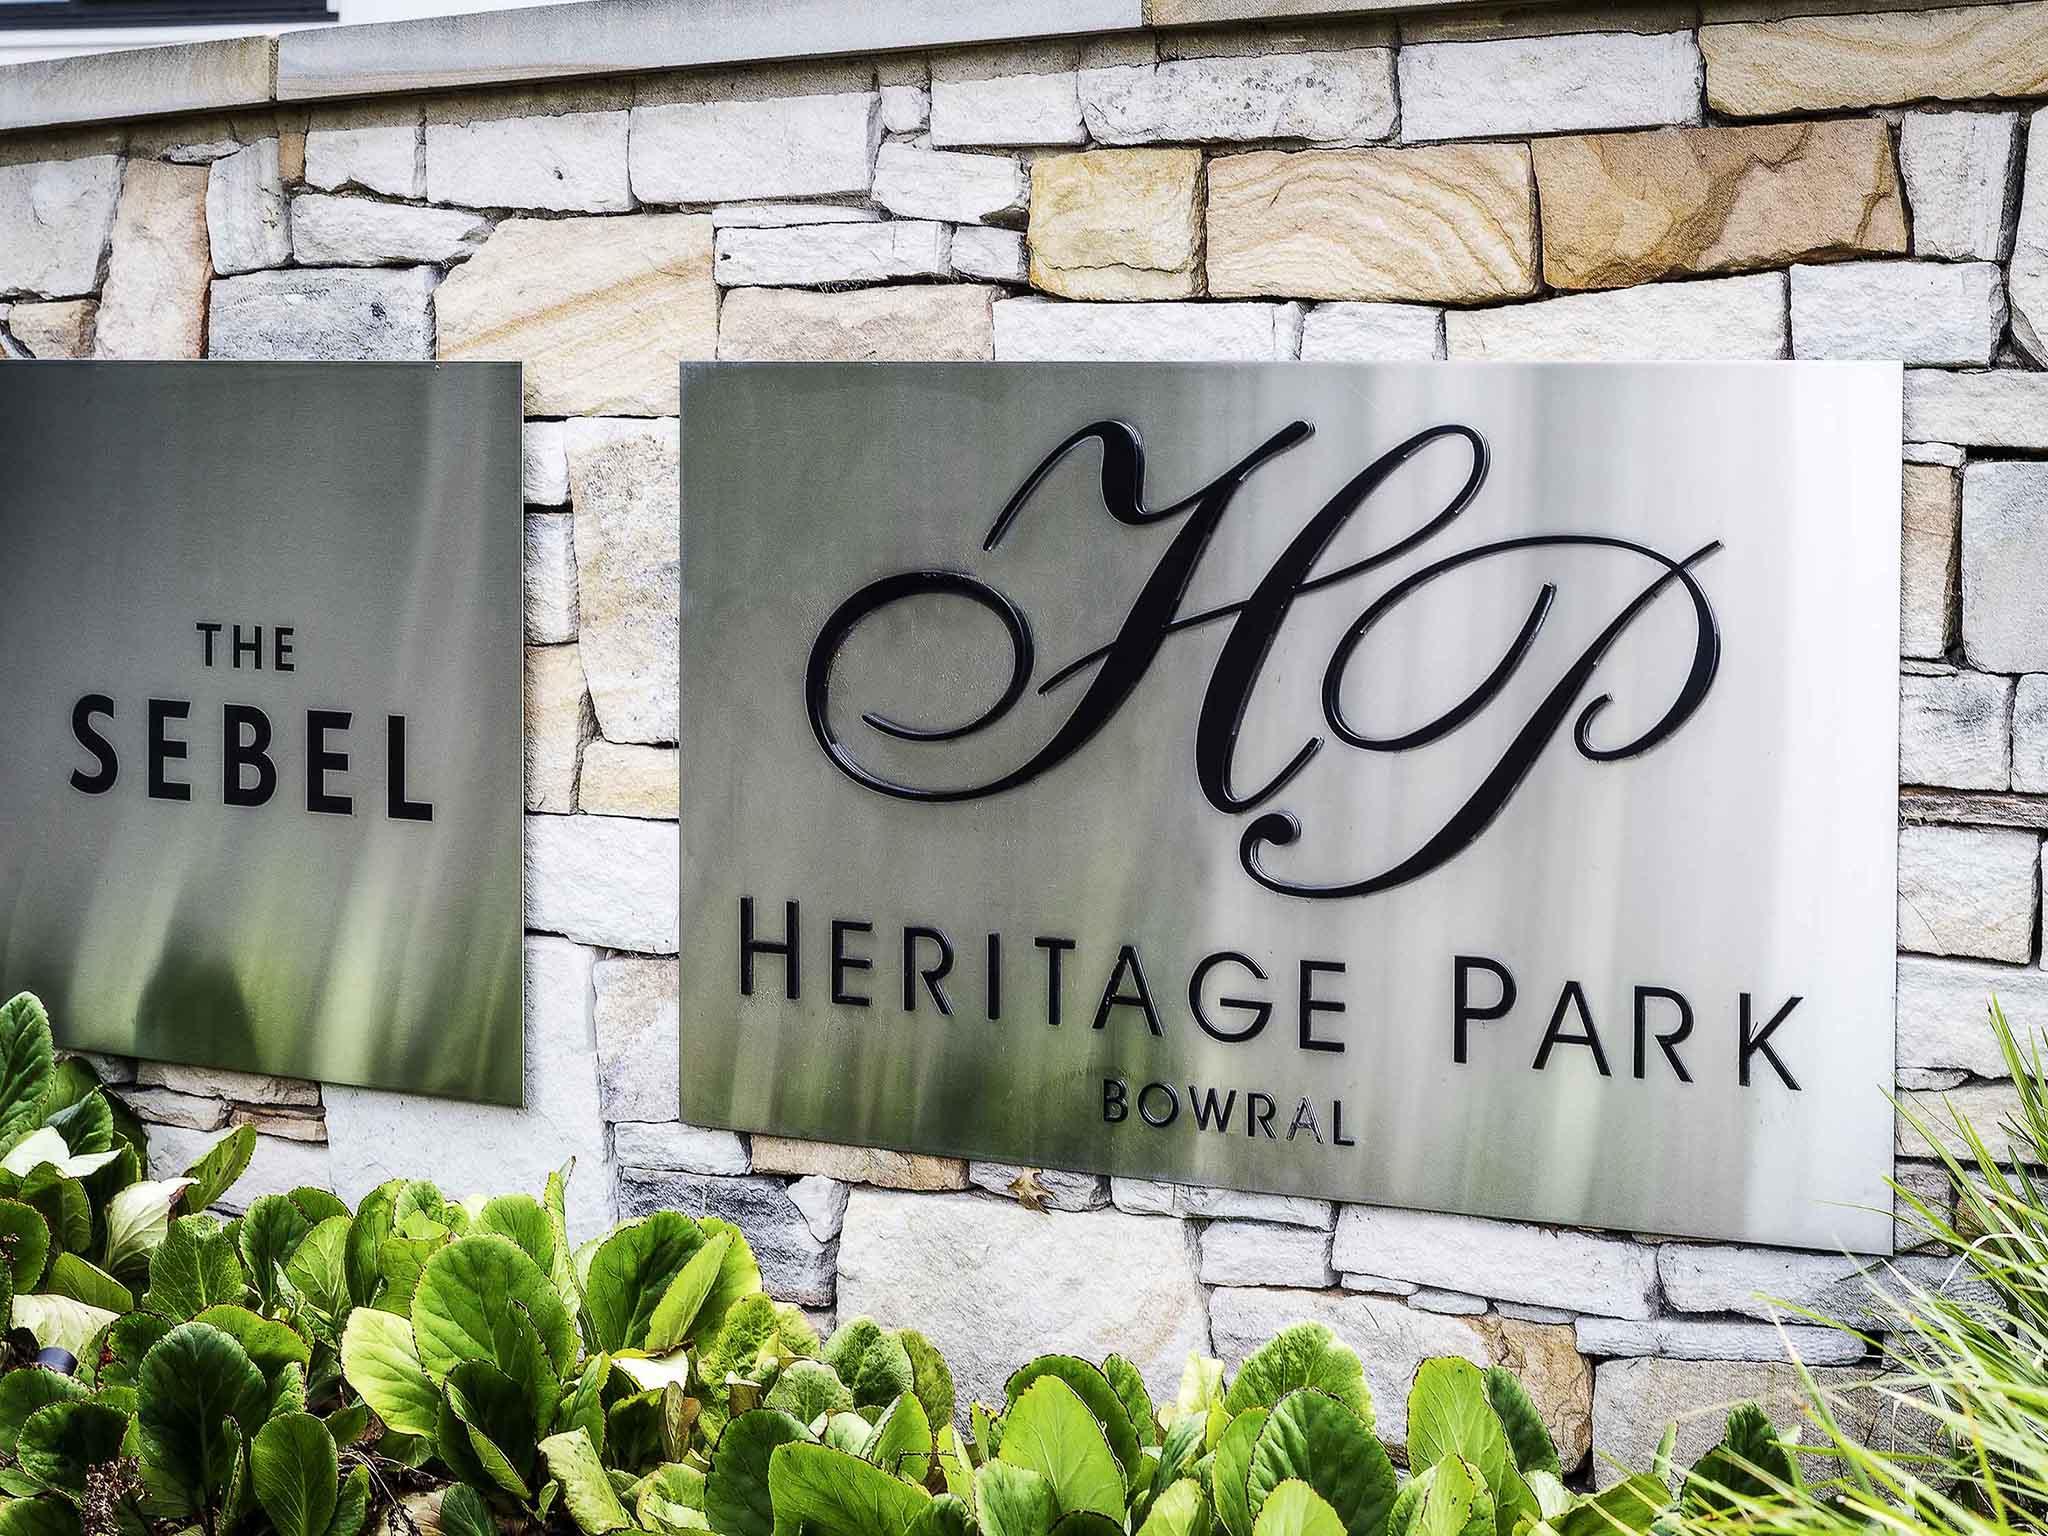 Hotel - The Sebel Bowral Heritage Park